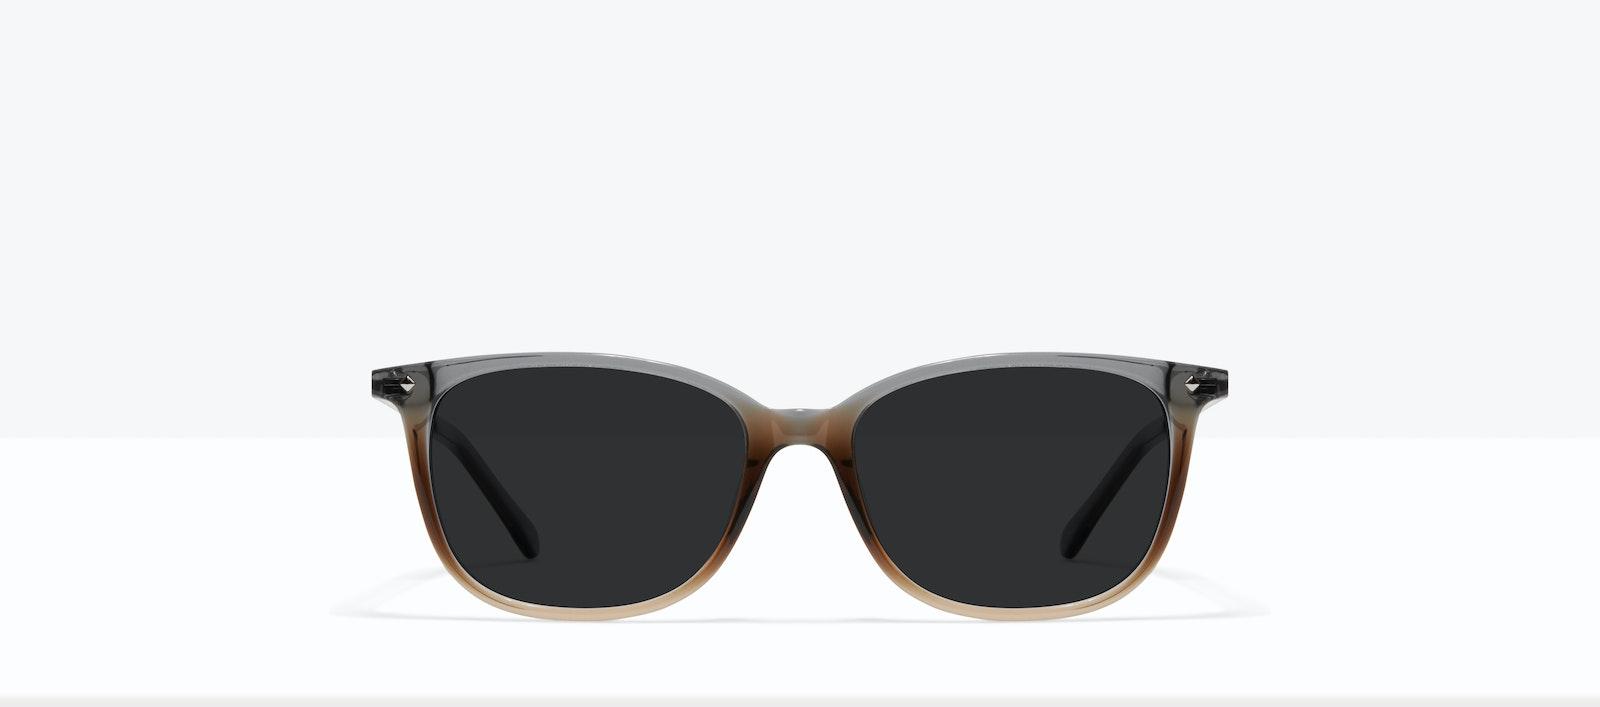 Affordable Fashion Glasses Rectangle Square Sunglasses Women Refine M Fog Front